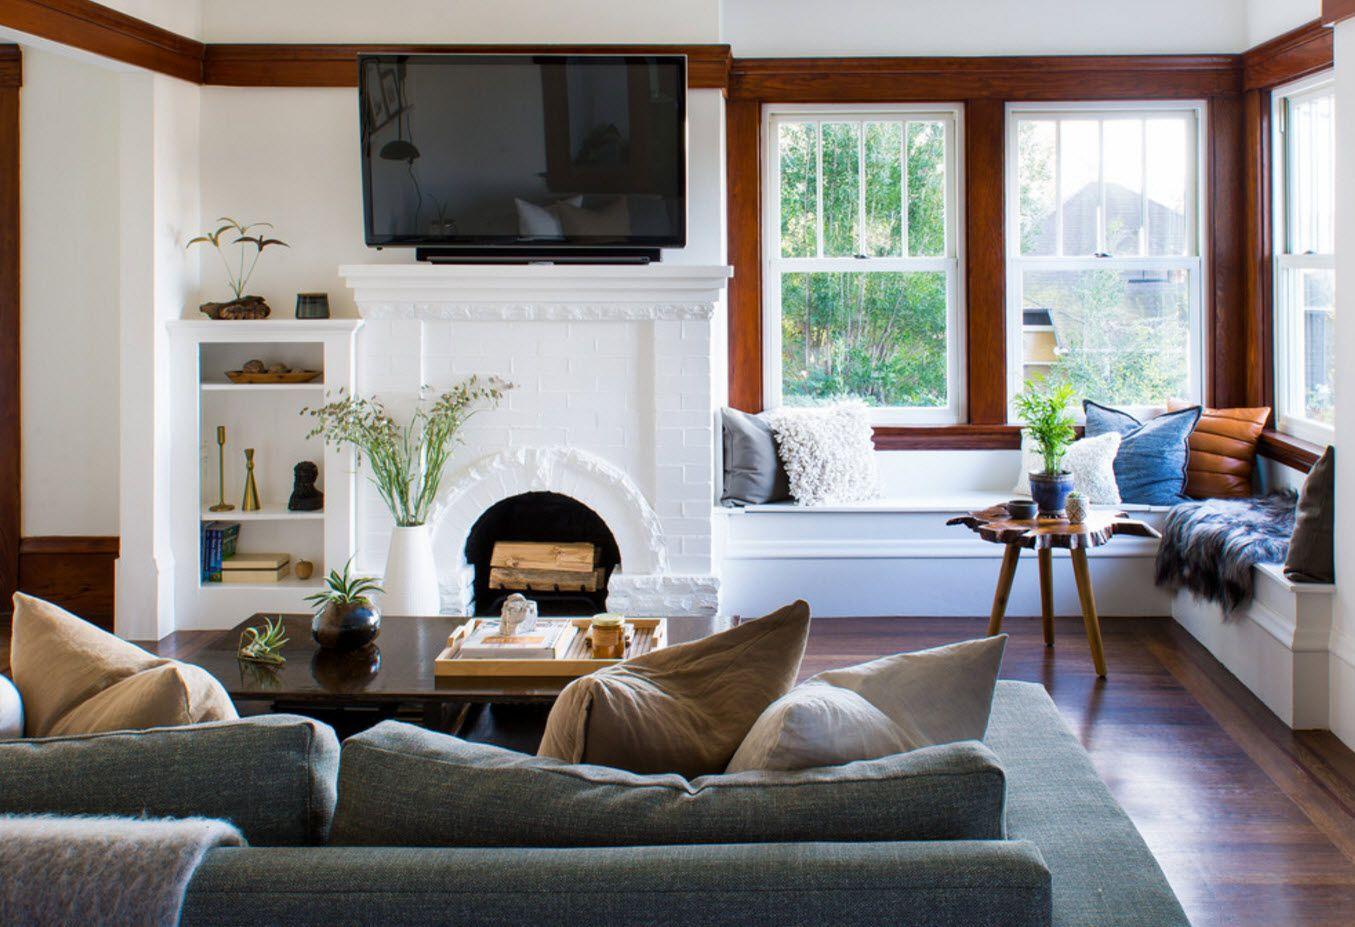 Light interior design with wooden frames